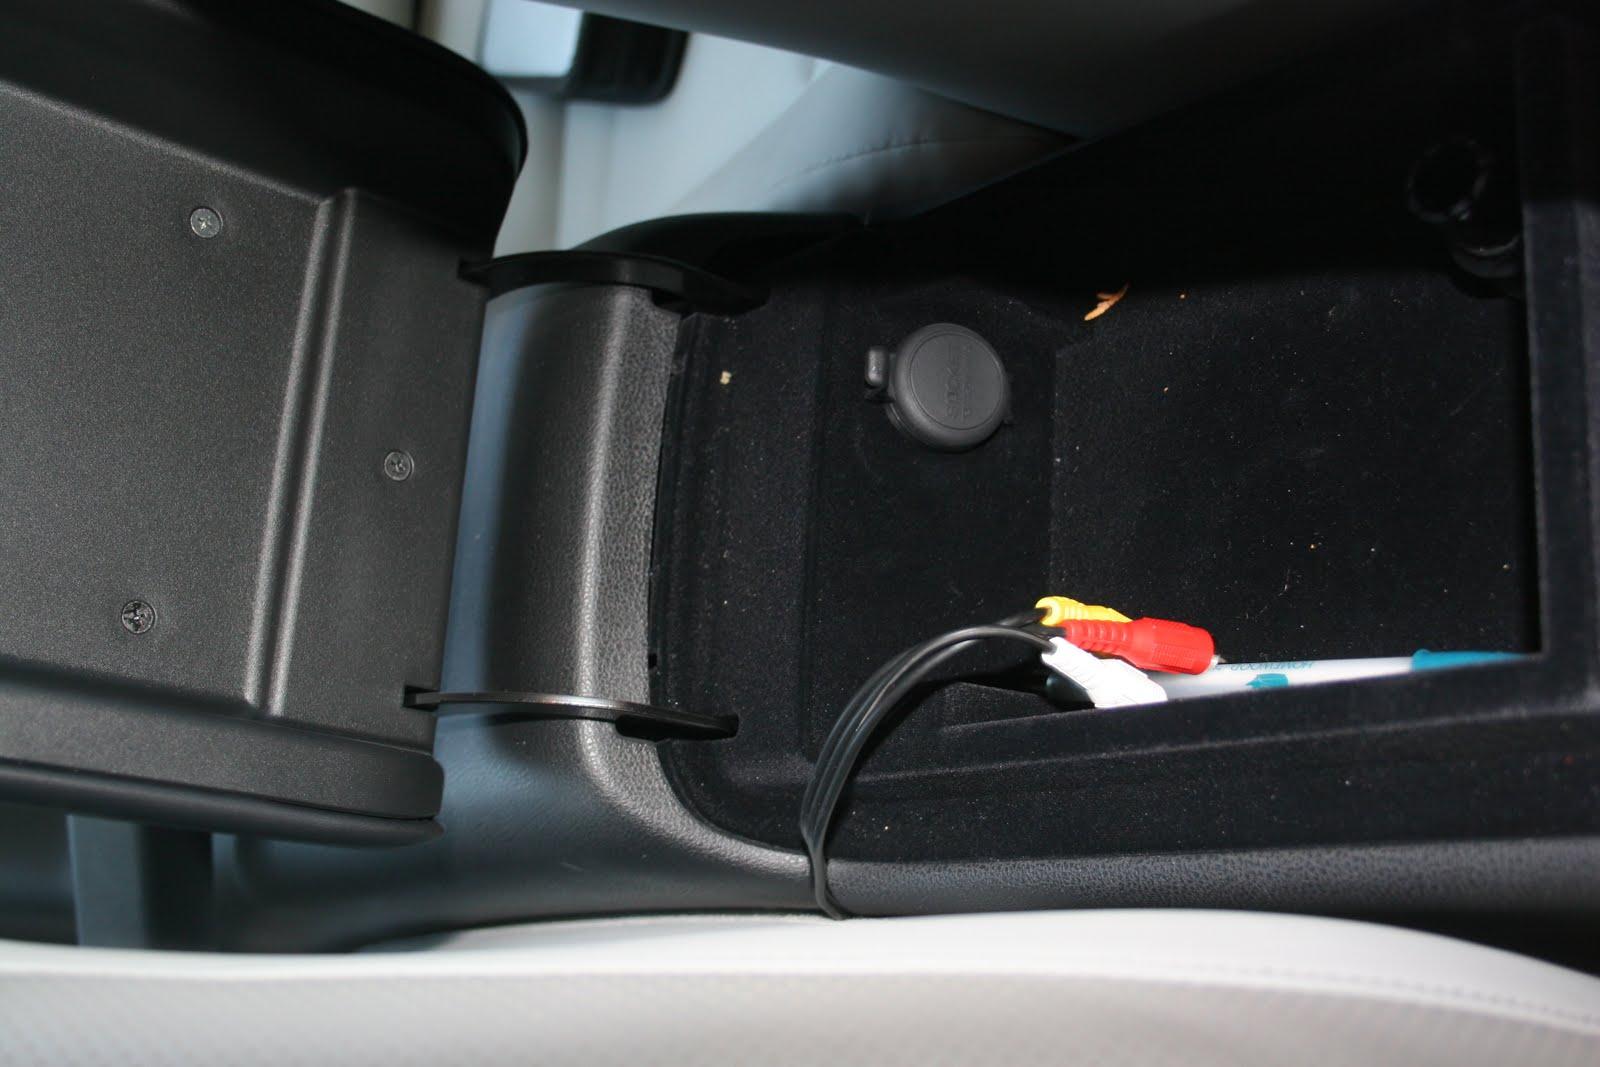 Auxav as well 2017 nissan murano 2678613 as well 2016 Nissan Rogue further Nissan pathfinder o2 air fuel sensor location further 1996 2003 infiniti i30 i35 o2 sensor location. on nissan murano audio system